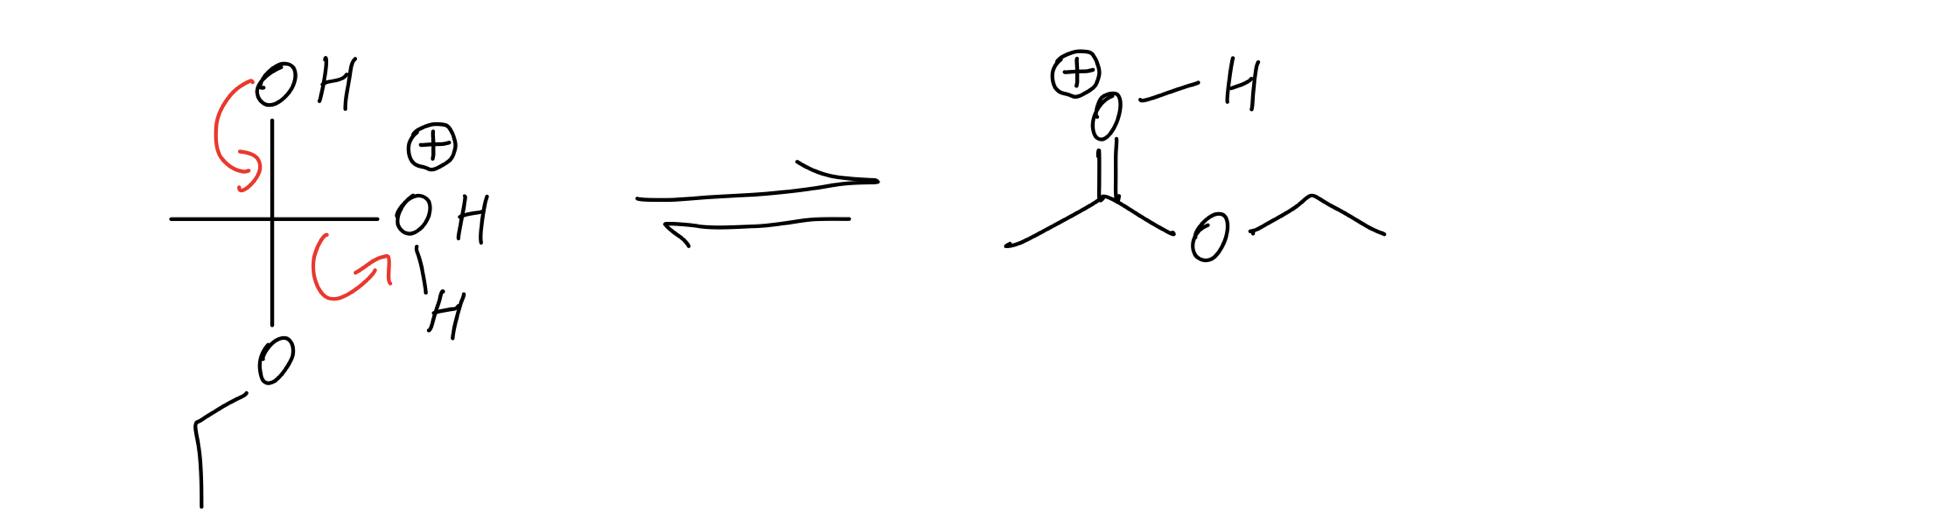 reform-the-carbonyl